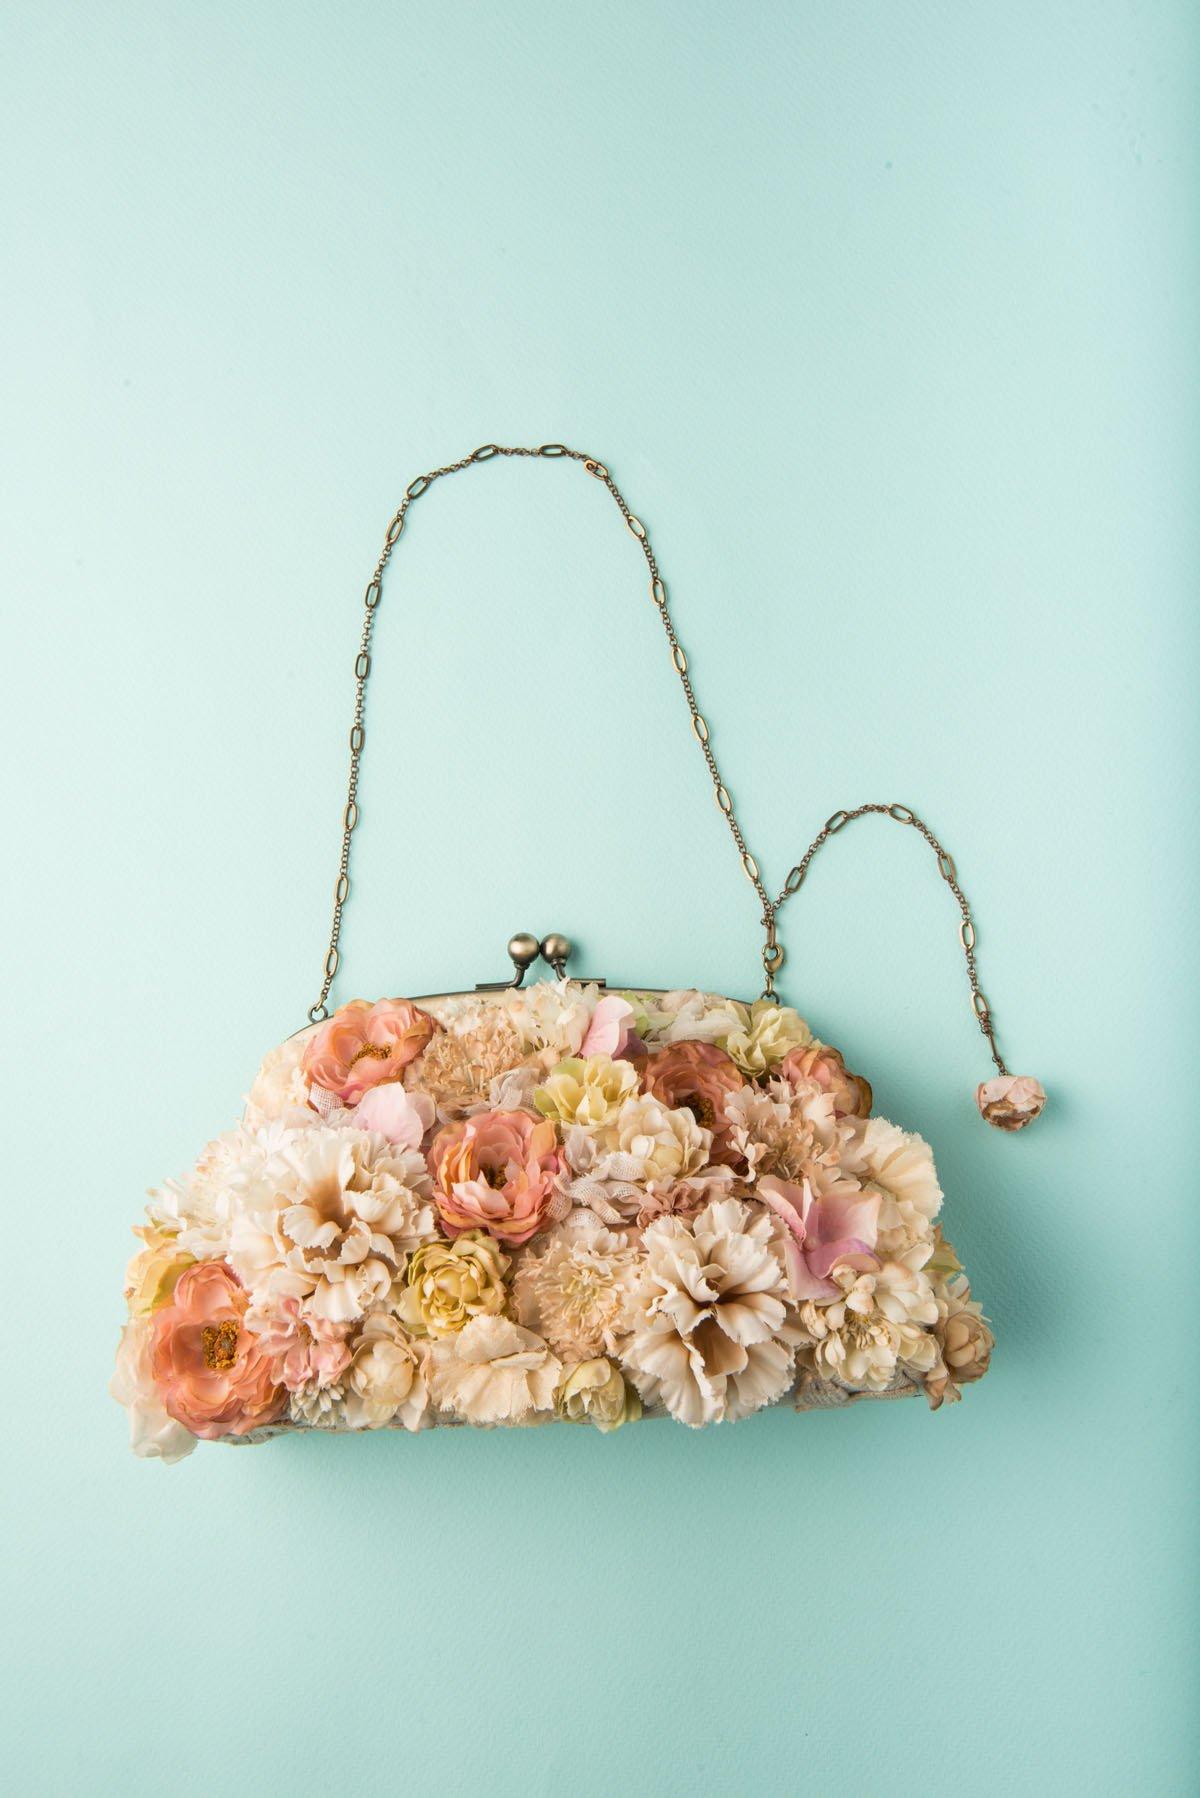 Bridal & Wedding Spring Flower Clutch | Cotton Flowers | Lace | Handmade in Japan